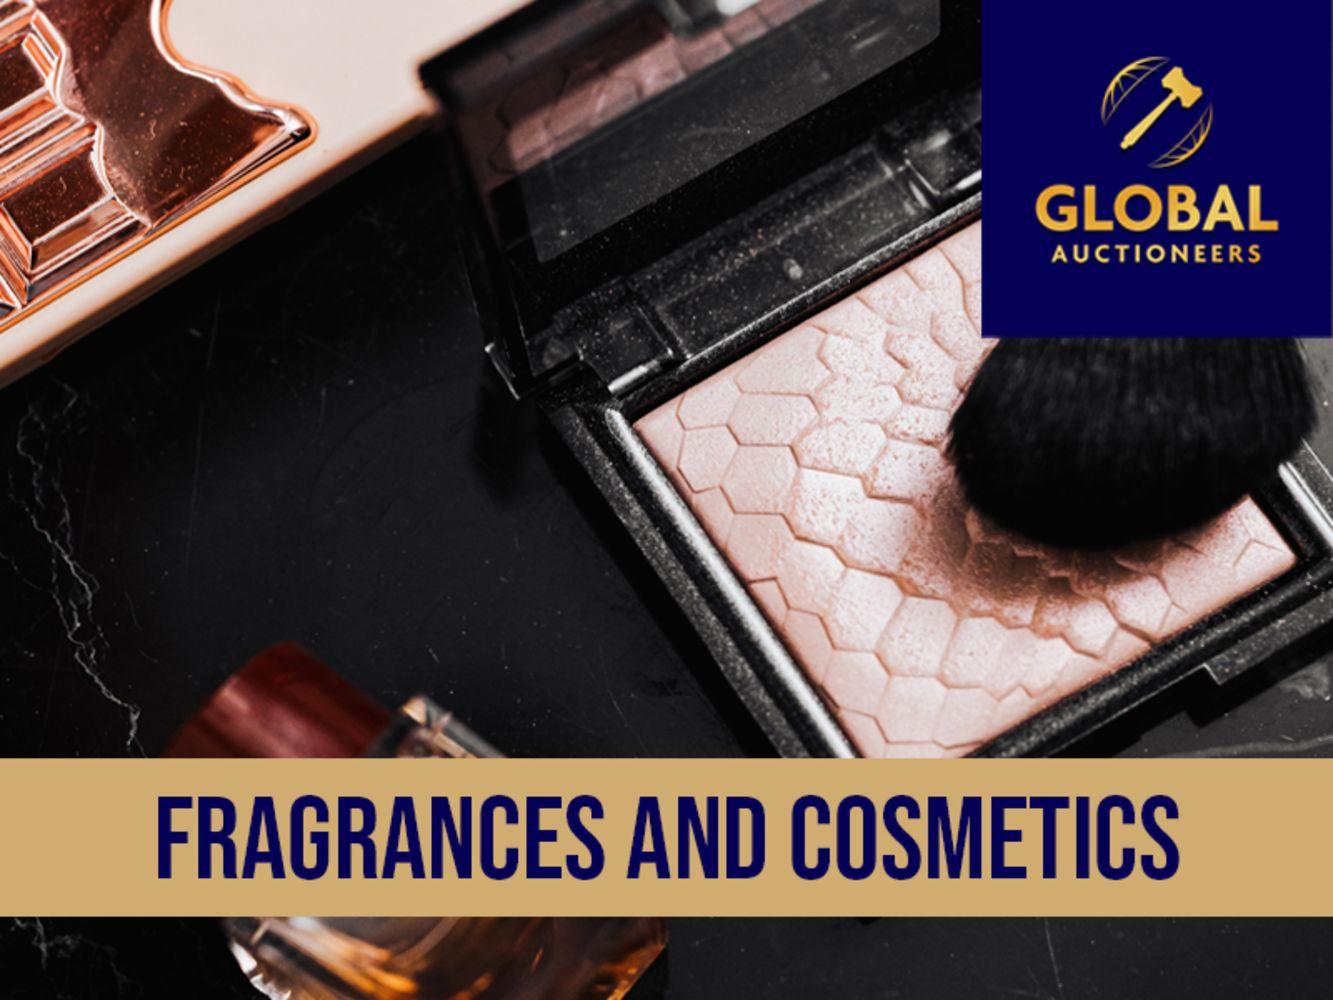 Sunday Luxury Sale - 8th August 2021